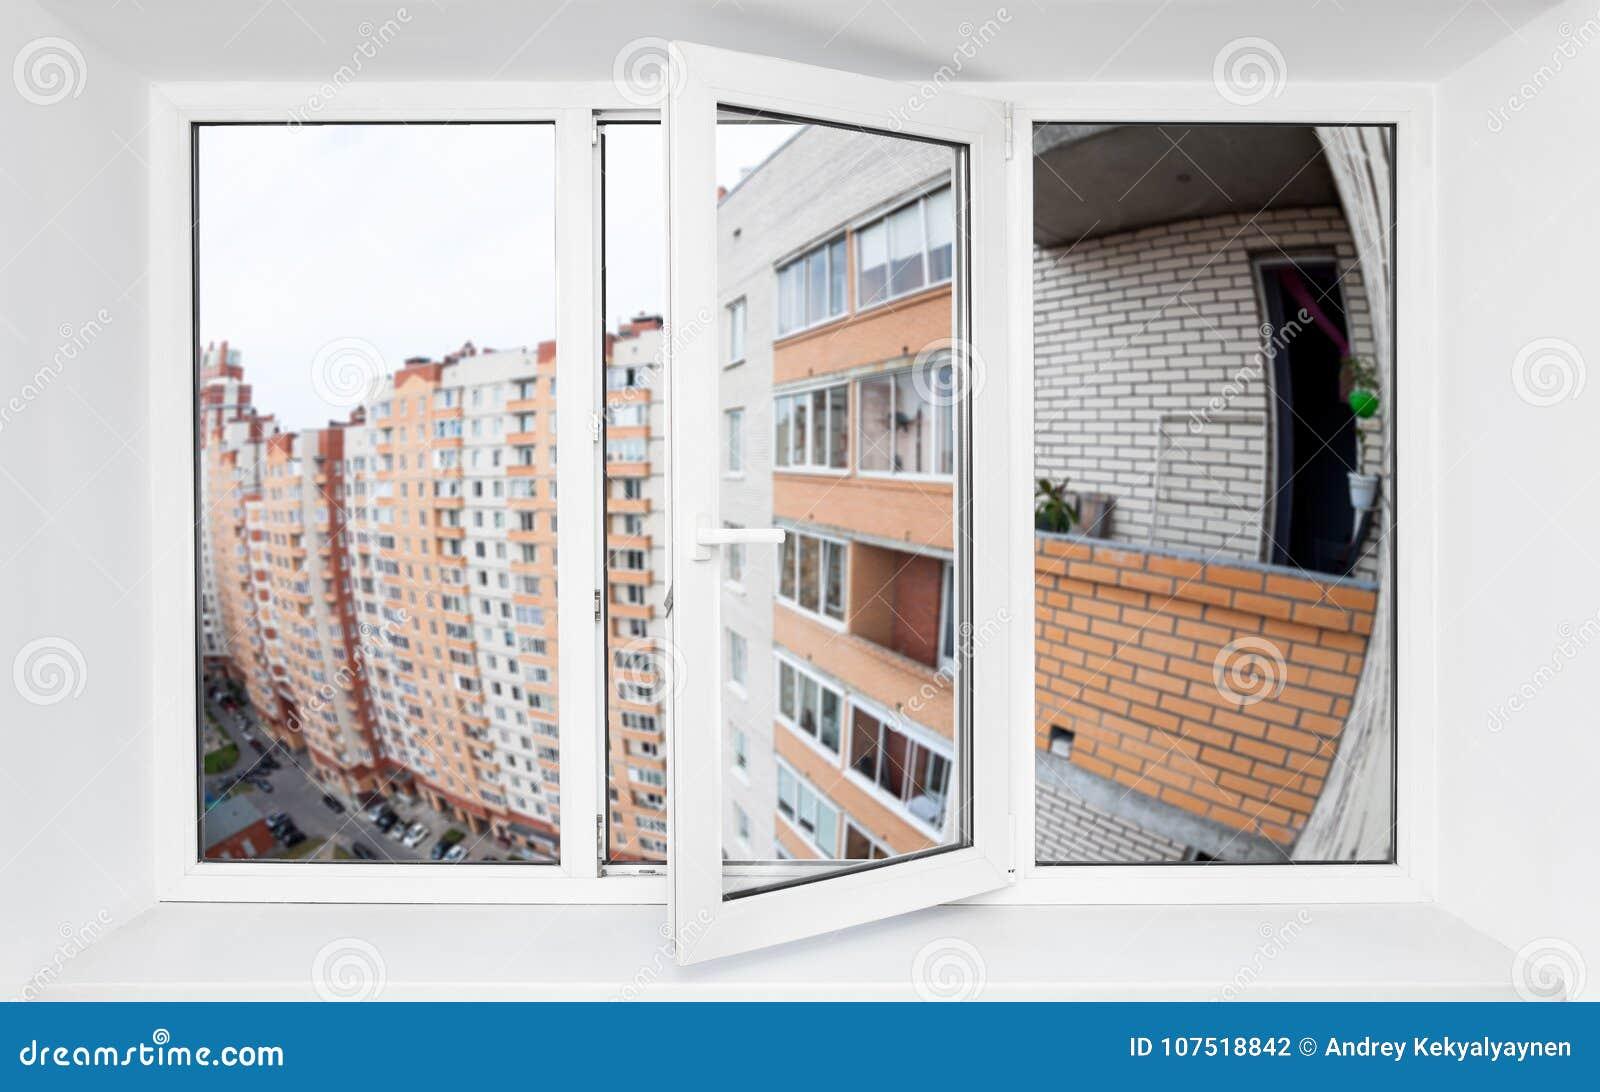 Tende Per Finestra Balcone : Tende per finestre pvc zetti arreda pavia tende per esterni a